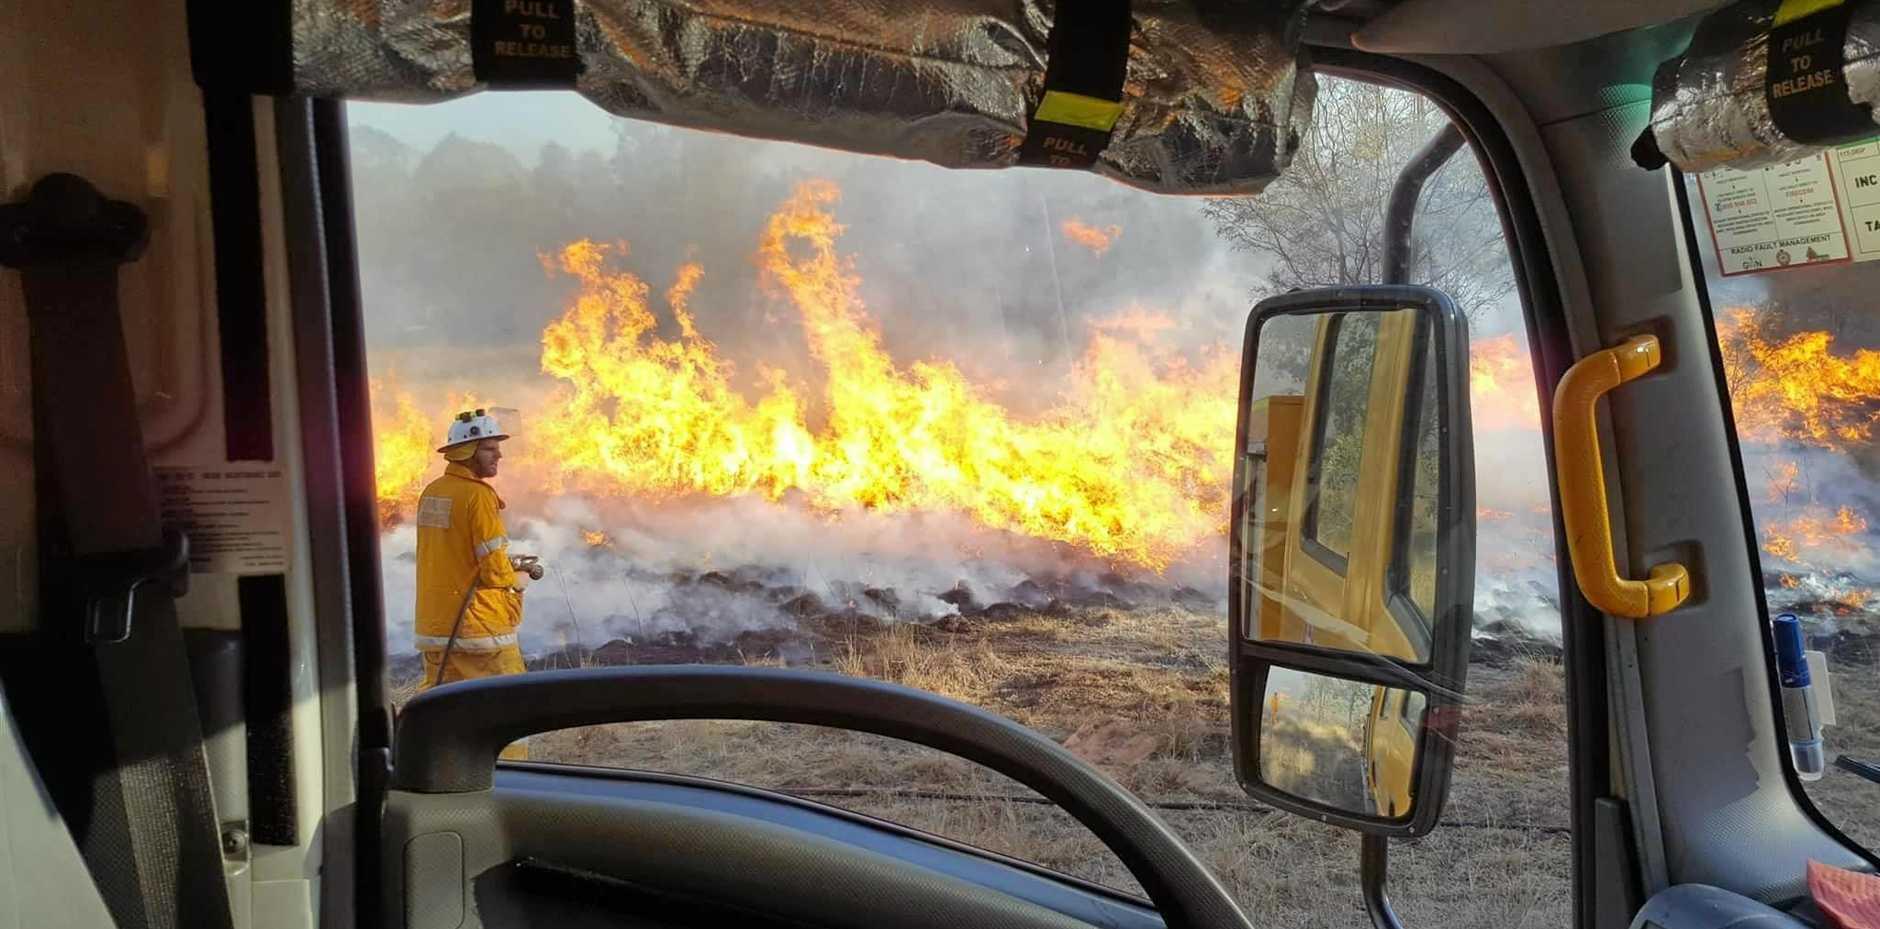 FAST-MOVING: Gowrie Little Plain Rural Fire Brigade Rural Fire Service crews battle a fast-moving bushfire at Cooyar.